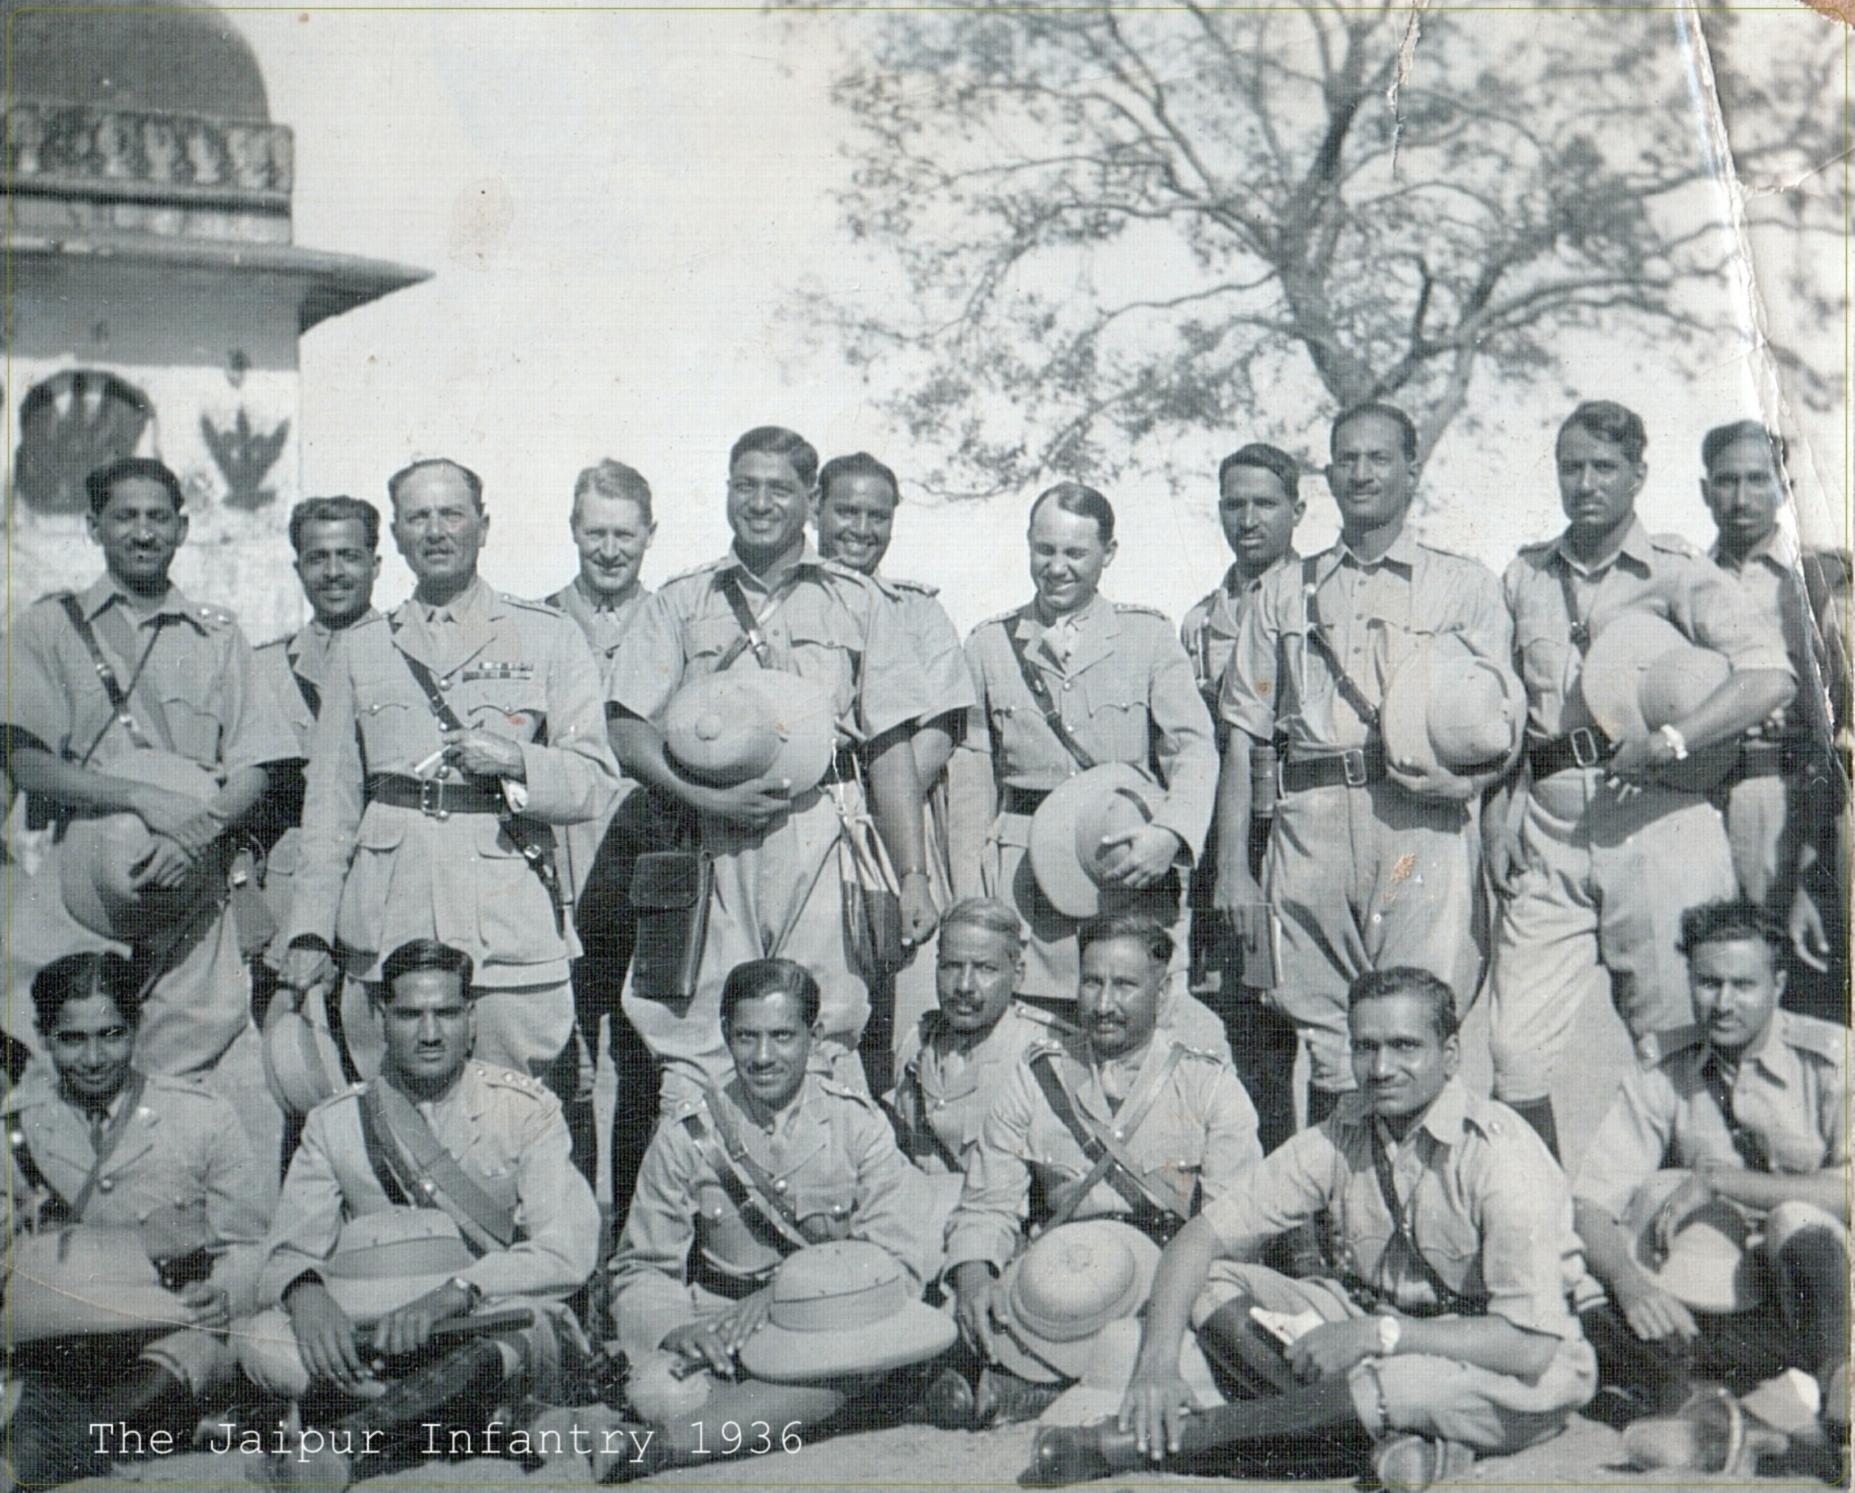 WIK_1936_The-Jaipur-infantry